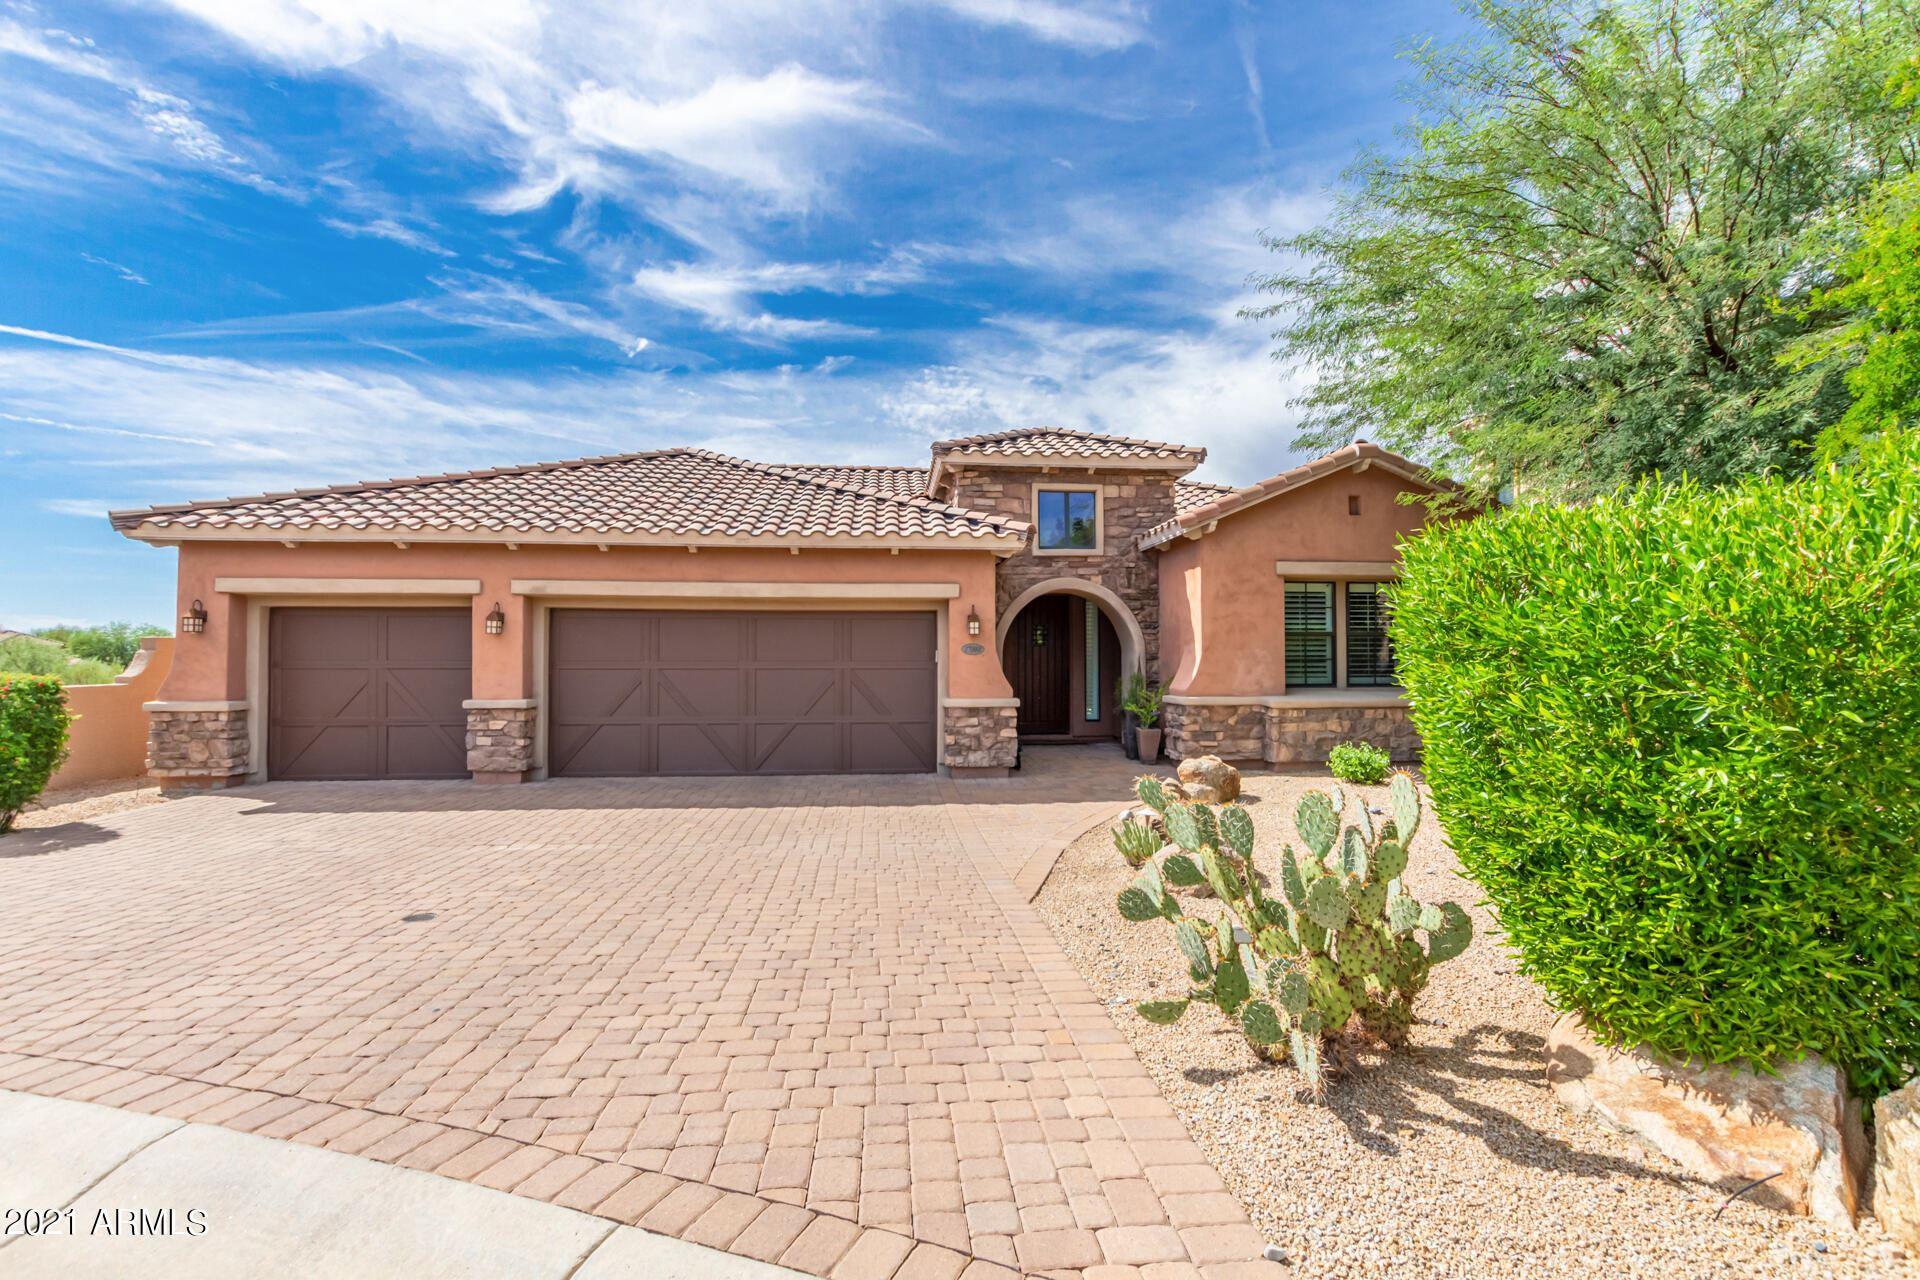 Photo of 17302 N 99TH Place, Scottsdale, AZ 85255 (MLS # 6307432)